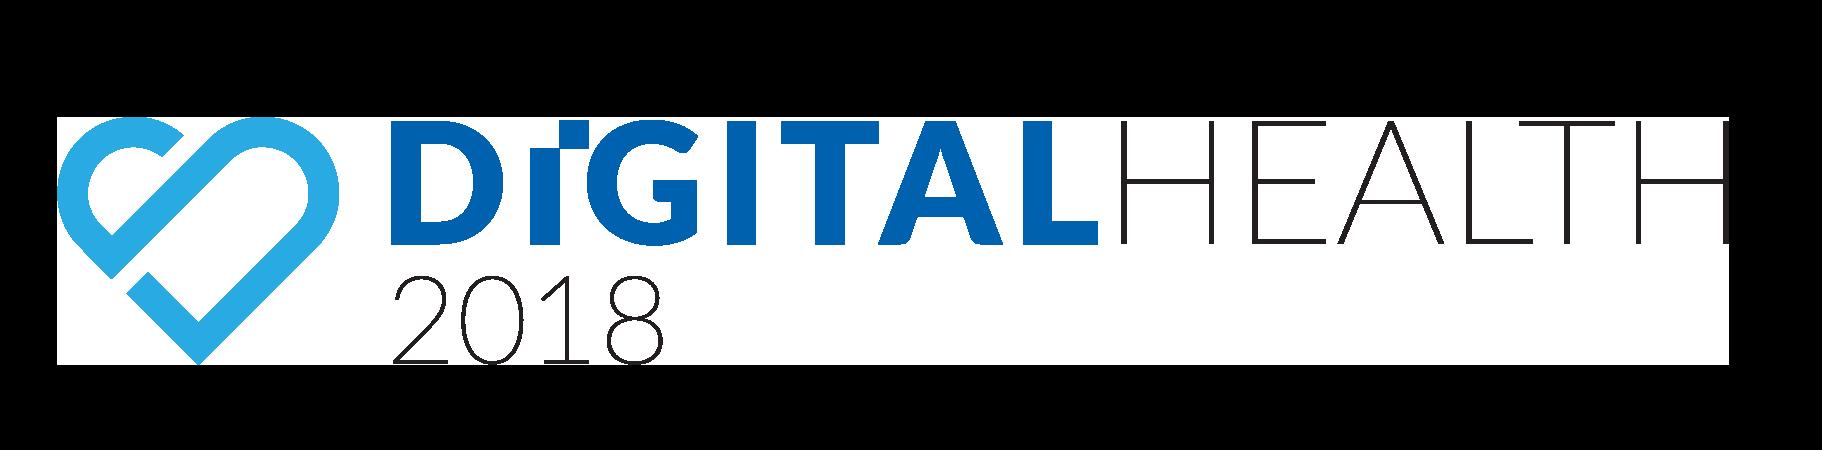 innokasmedical_digital health nordic